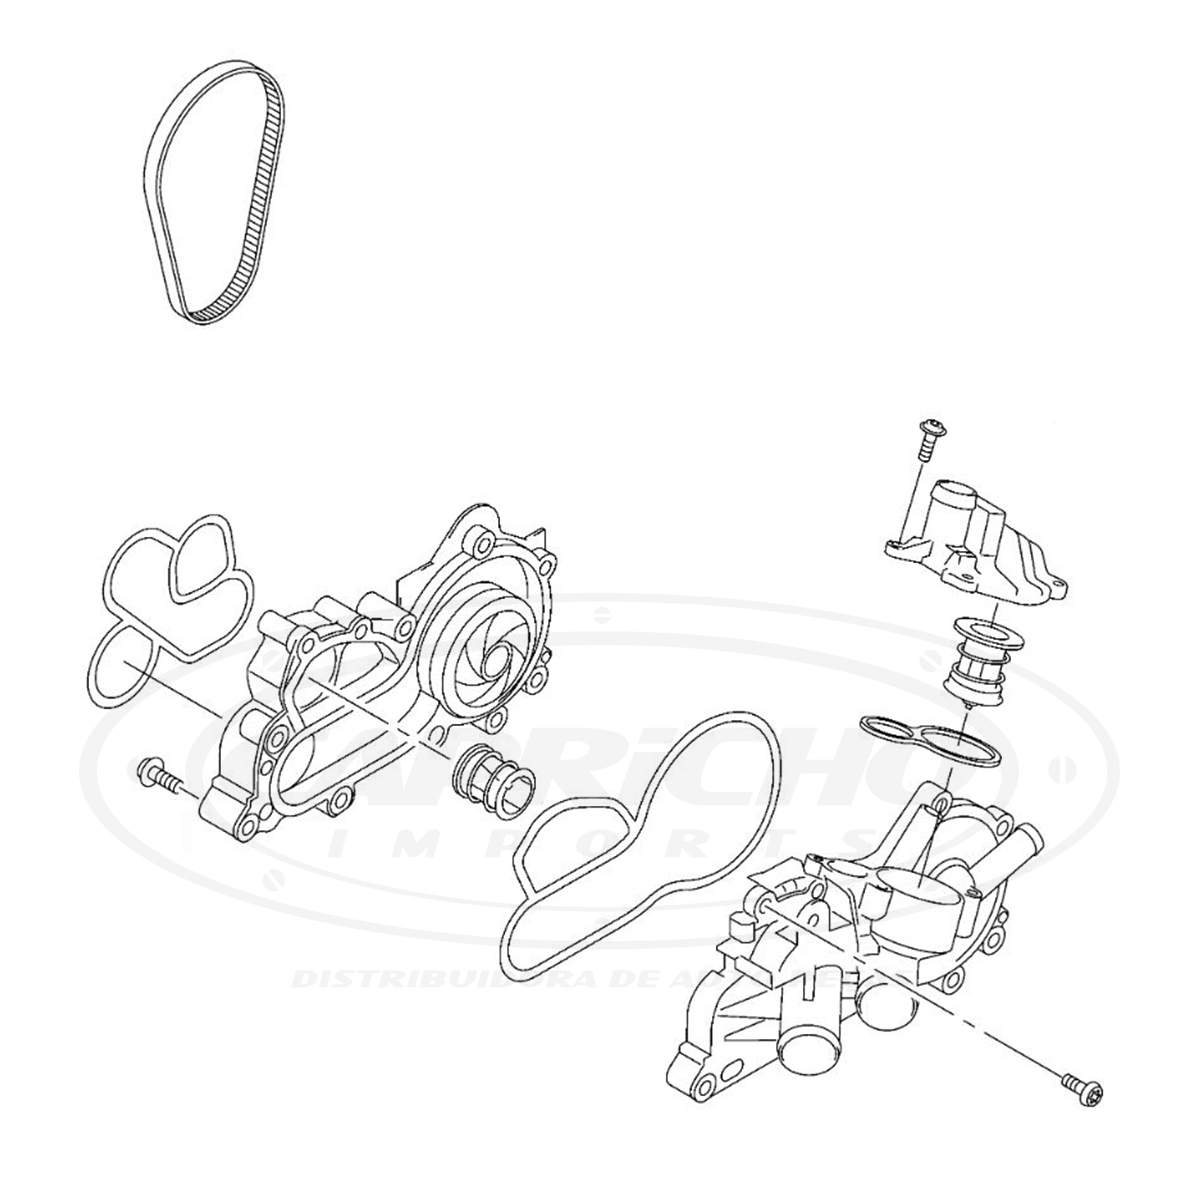 BOMBA DE ÁGUA VW UP FOX GOL GOLF JETTA SAVEIRO 1.0 1.4 1.6 AUDI A1 A3 Q3 1.4